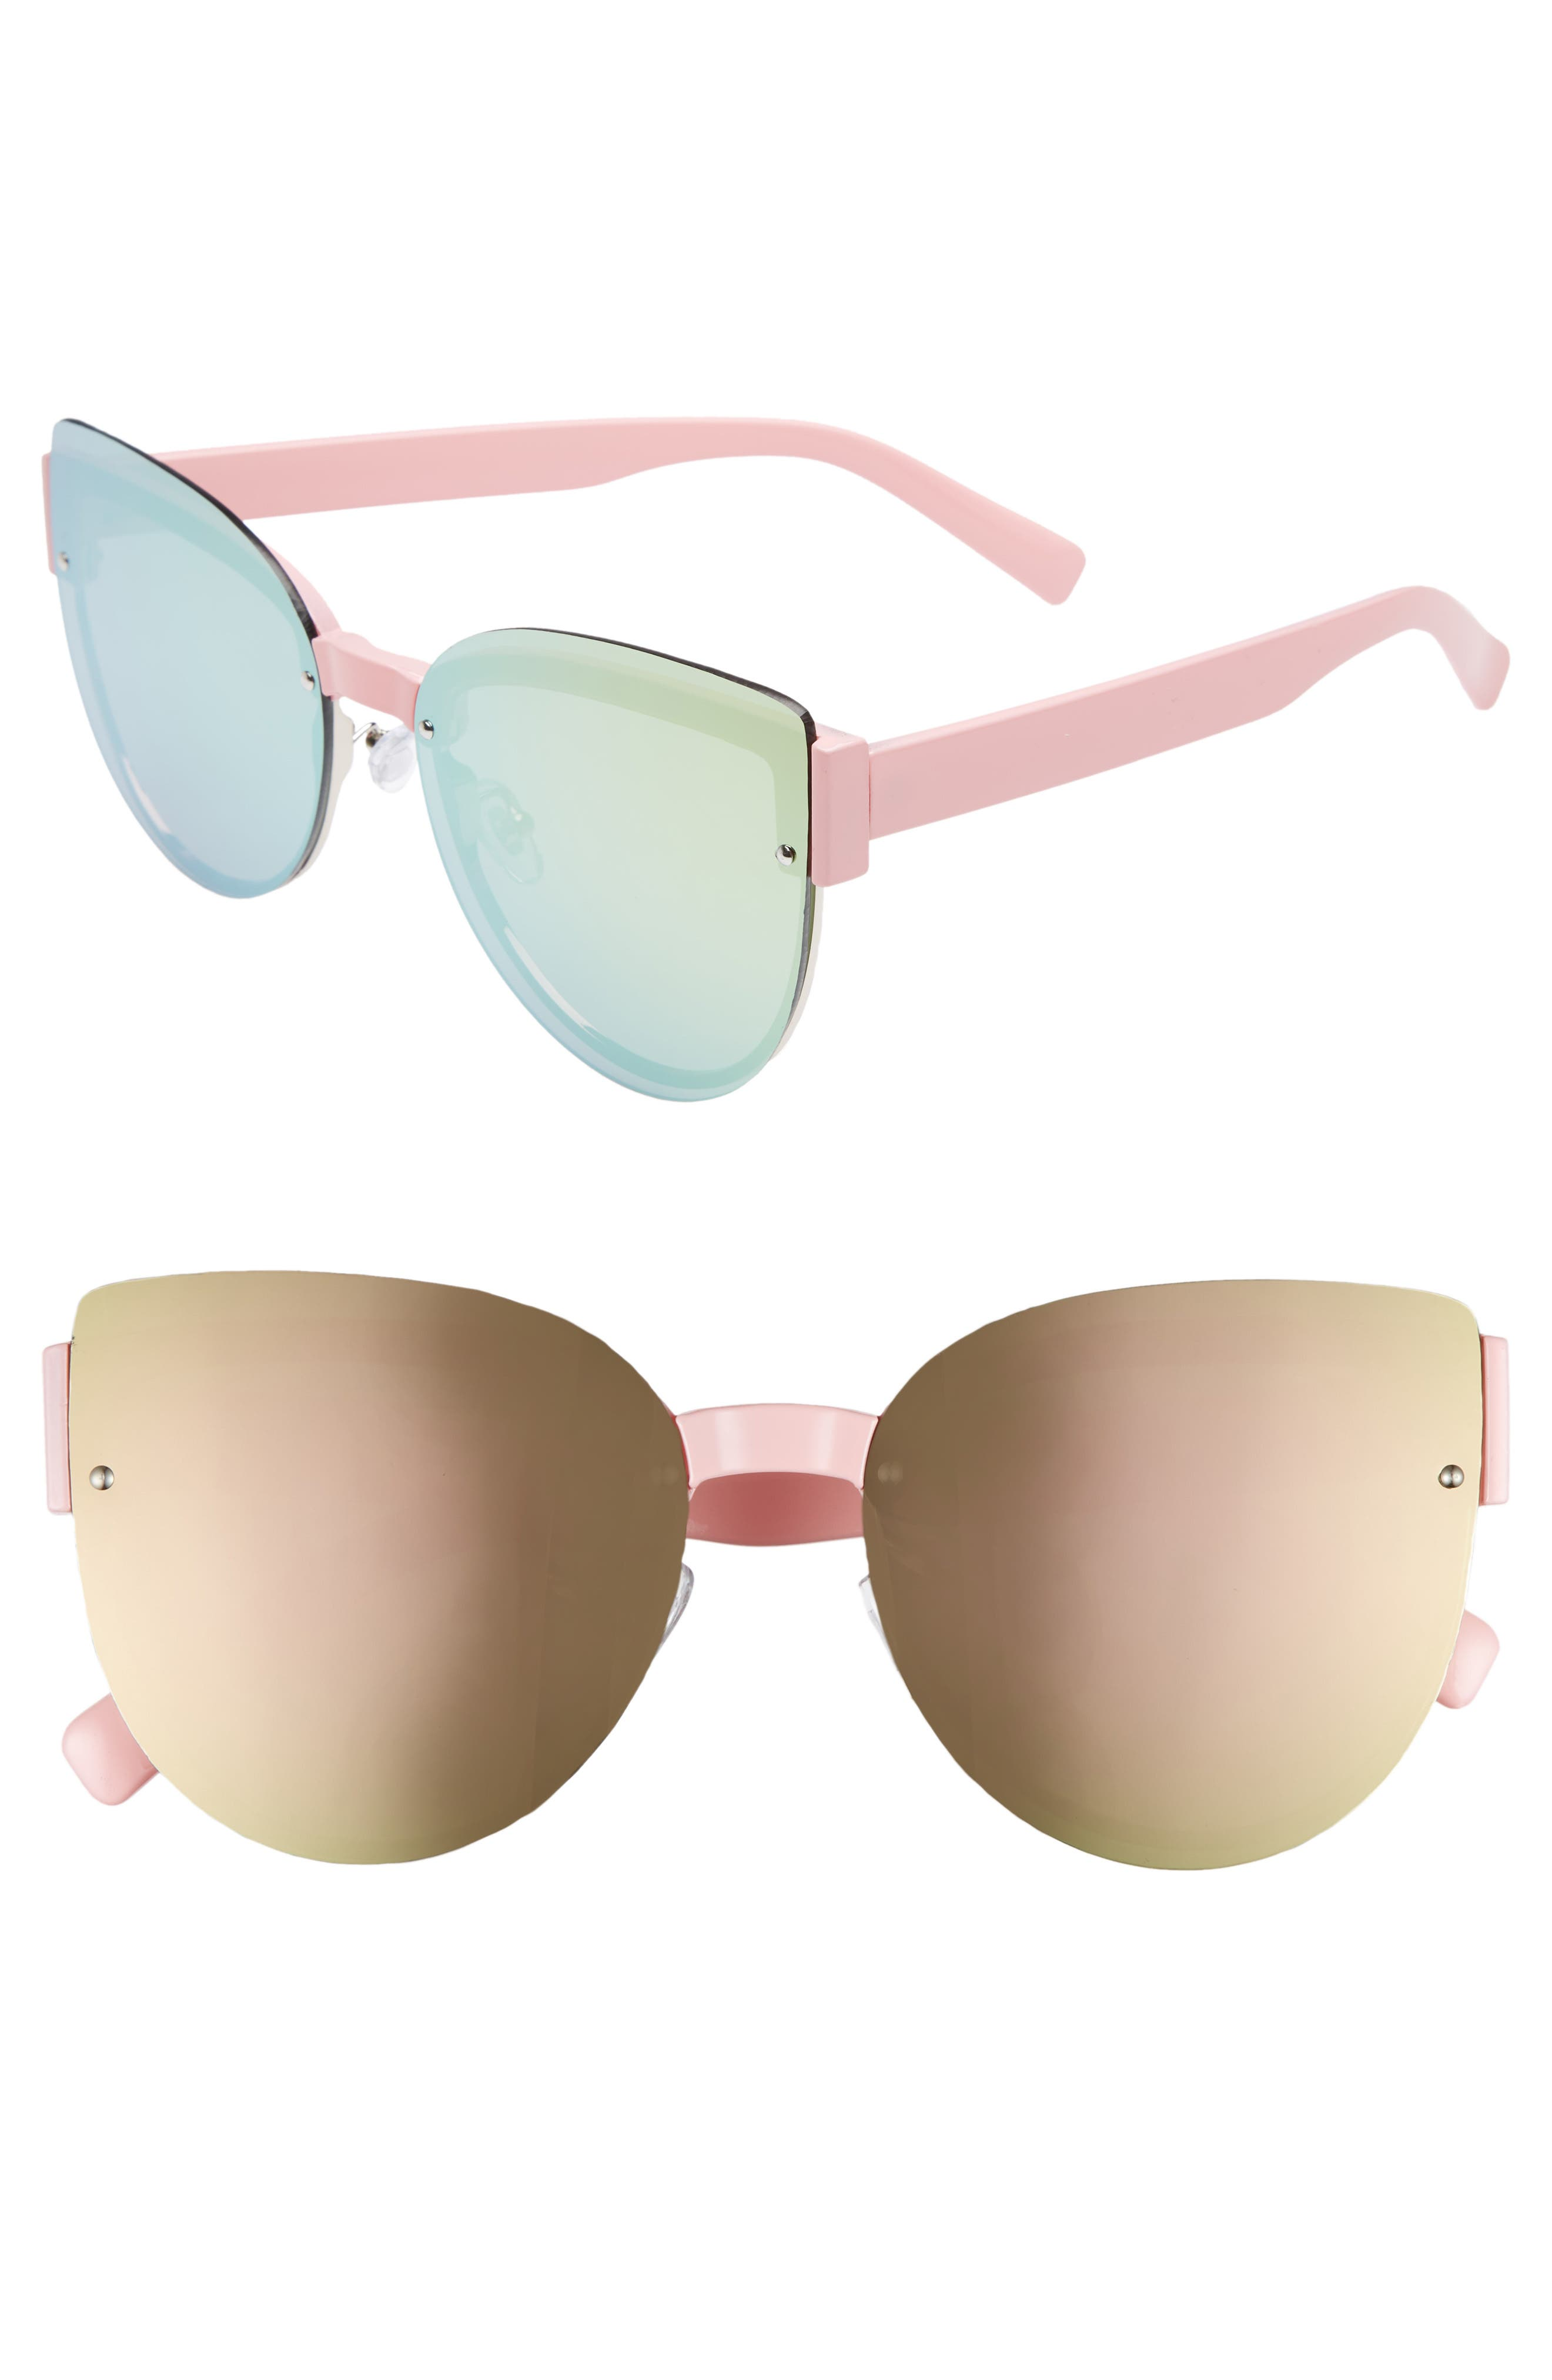 62mm Oversize Rimless Cat Eye Sunglasses,                             Main thumbnail 1, color,                             Pink